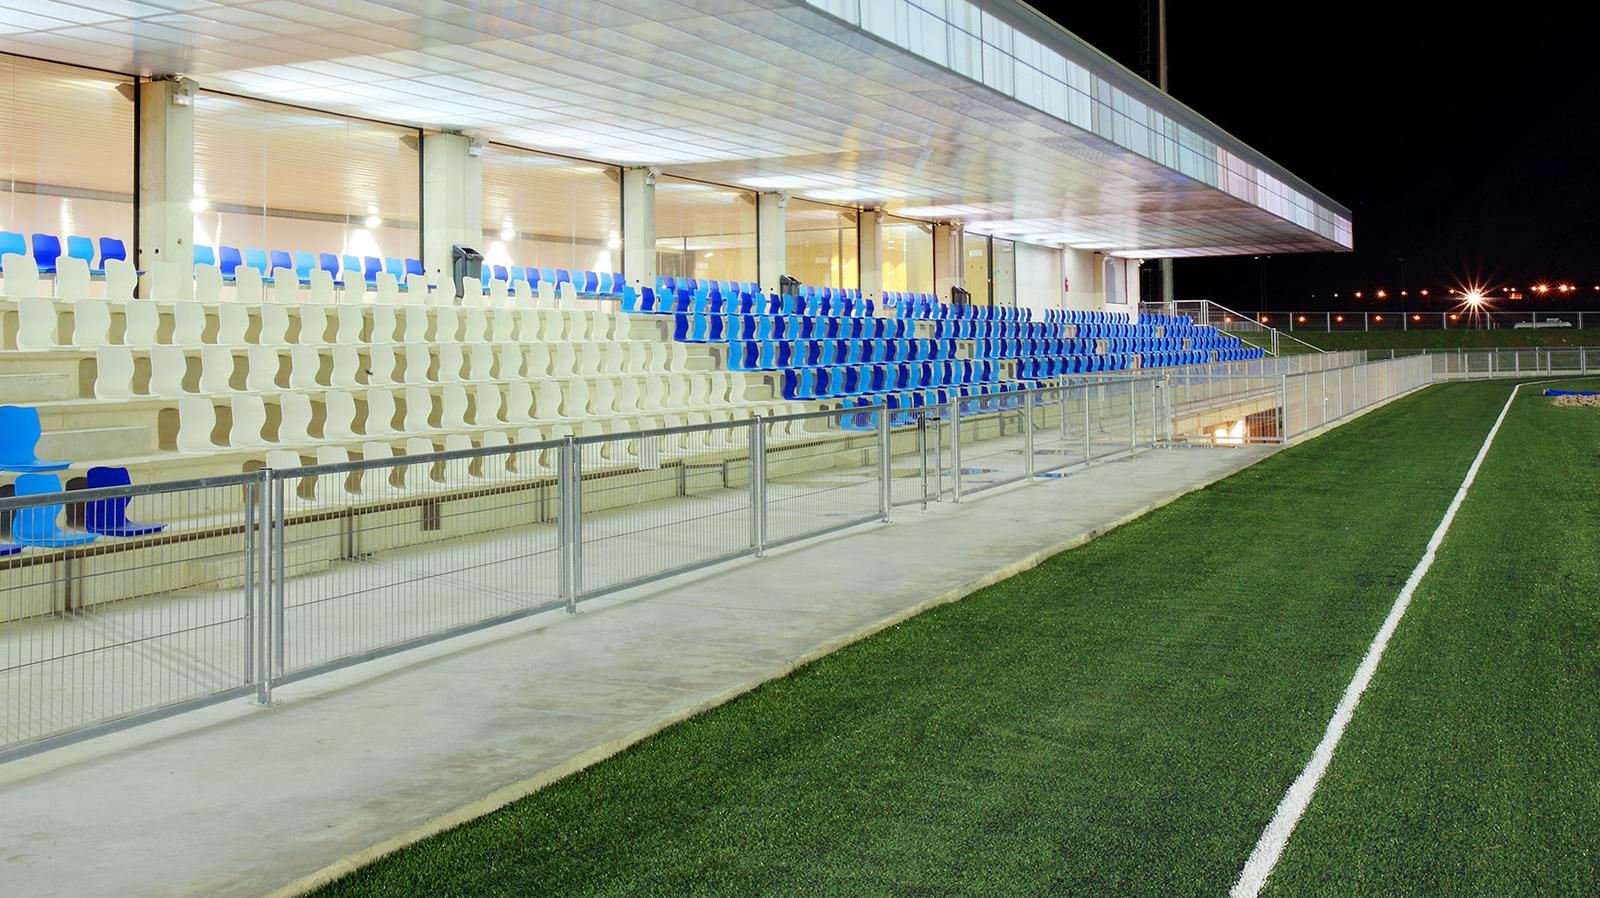 Gradas de la pista de atletismo de magaluf , athletics track magaluf spectators , Entrena atletismo en Mallorca , Athletics track in Mallorca